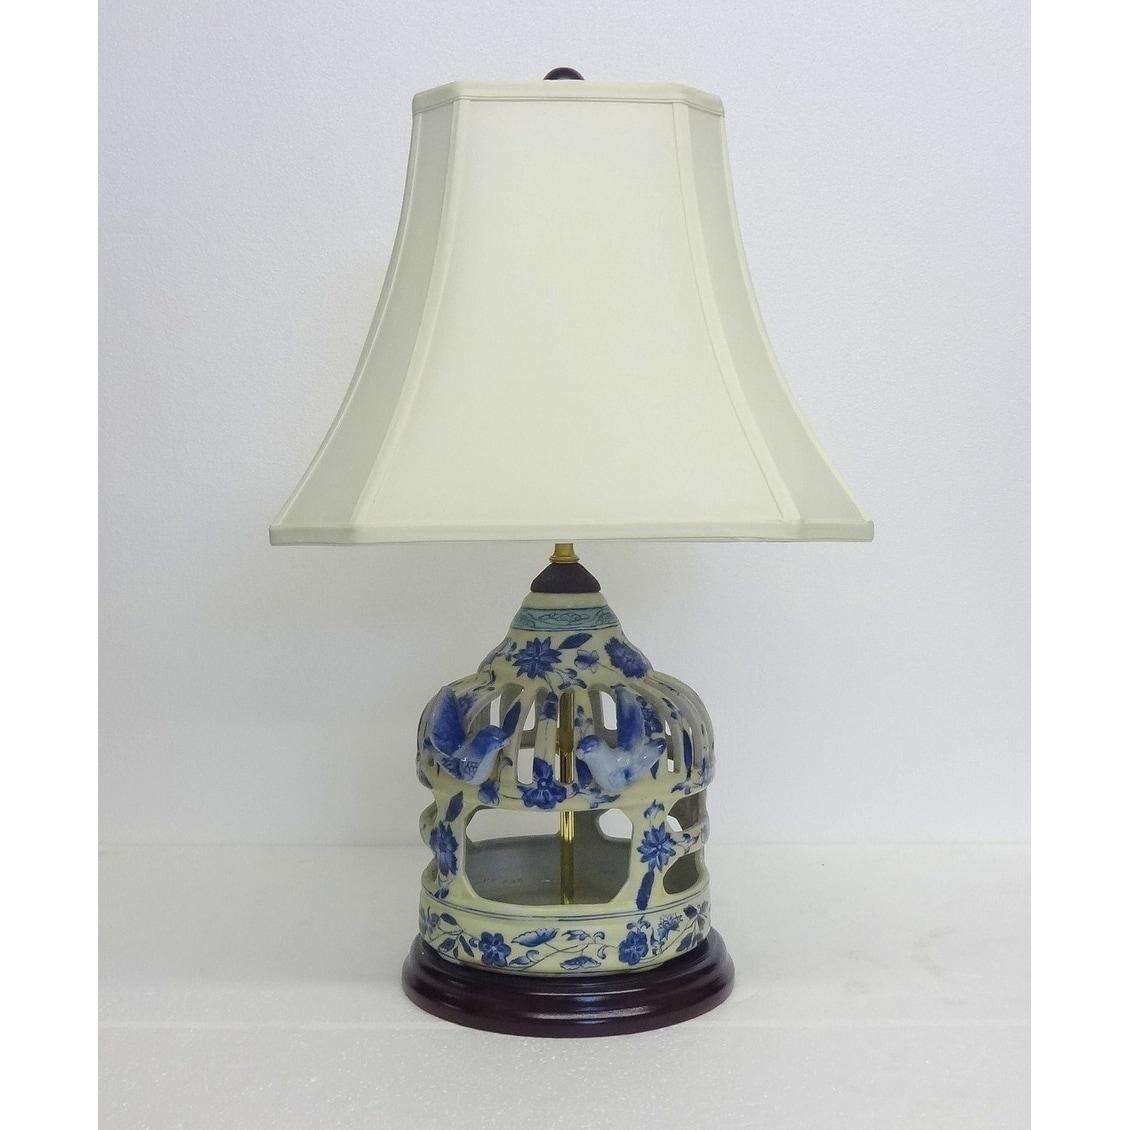 Etonnant Details About Floral Vine Birdcage Blue And White Porcelain Table Lamp